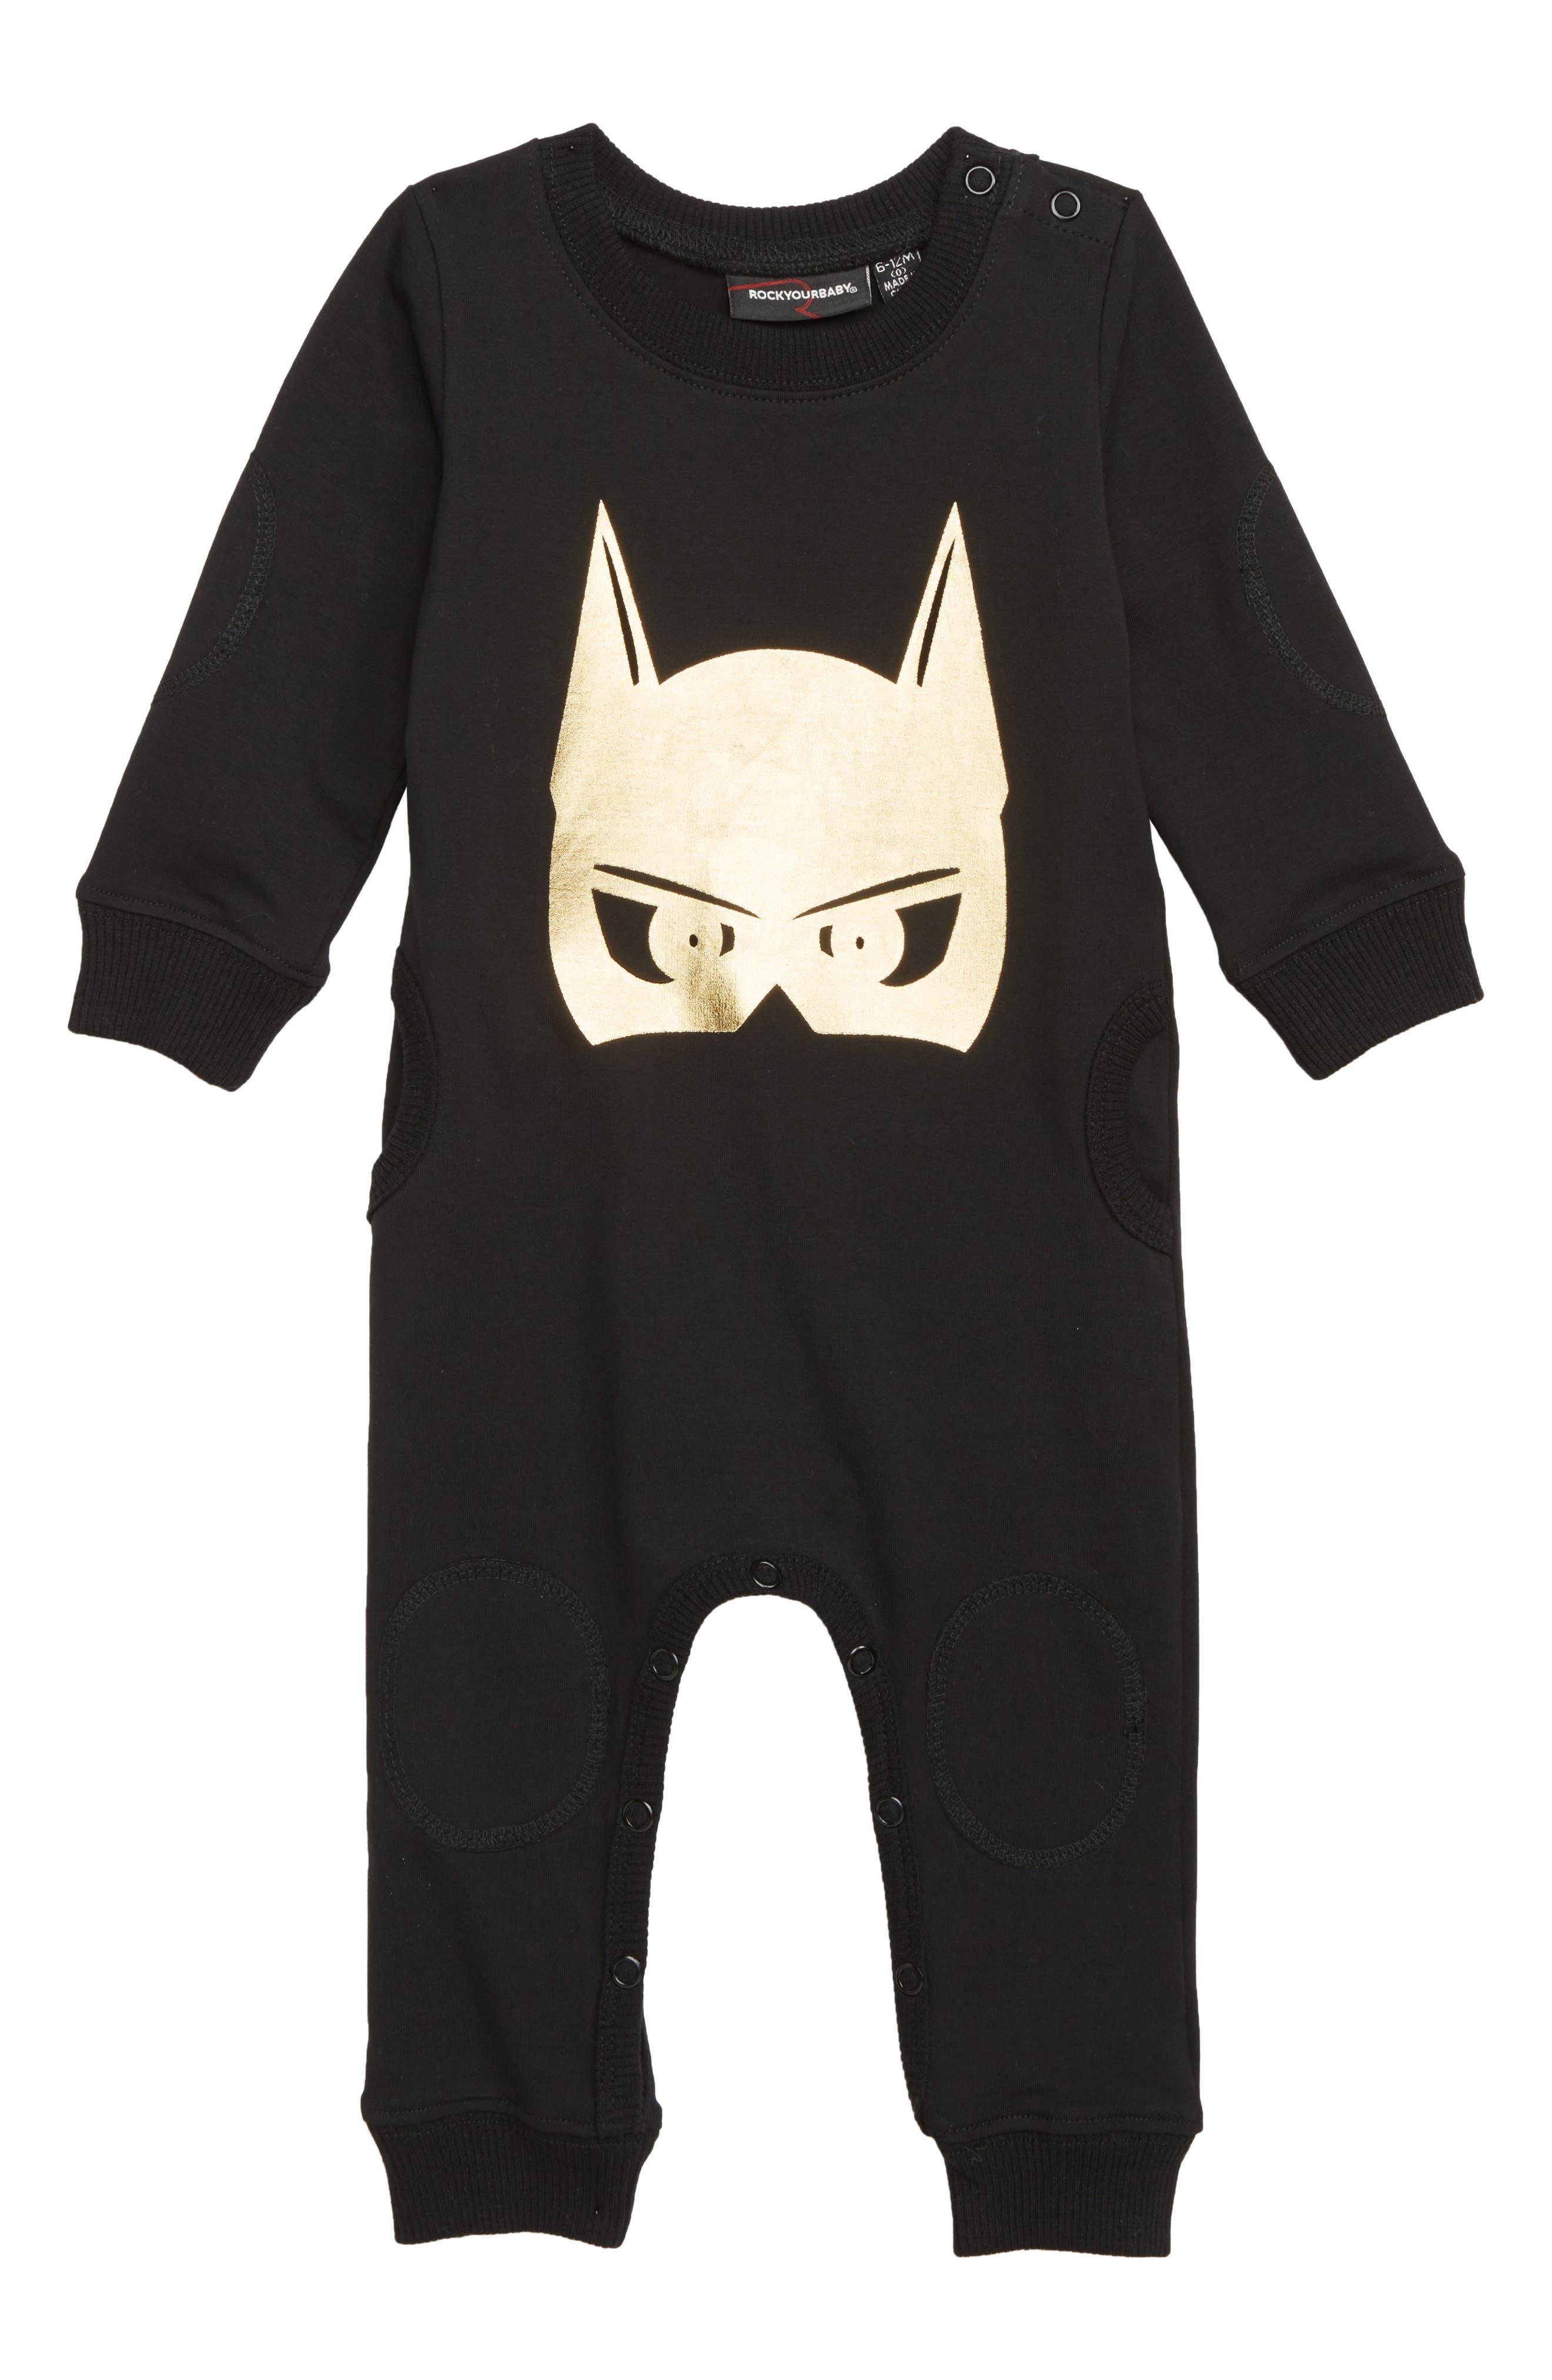 Infant Boys Rock Your Baby Batman Caped Crusader Romper Size 1218M  Black